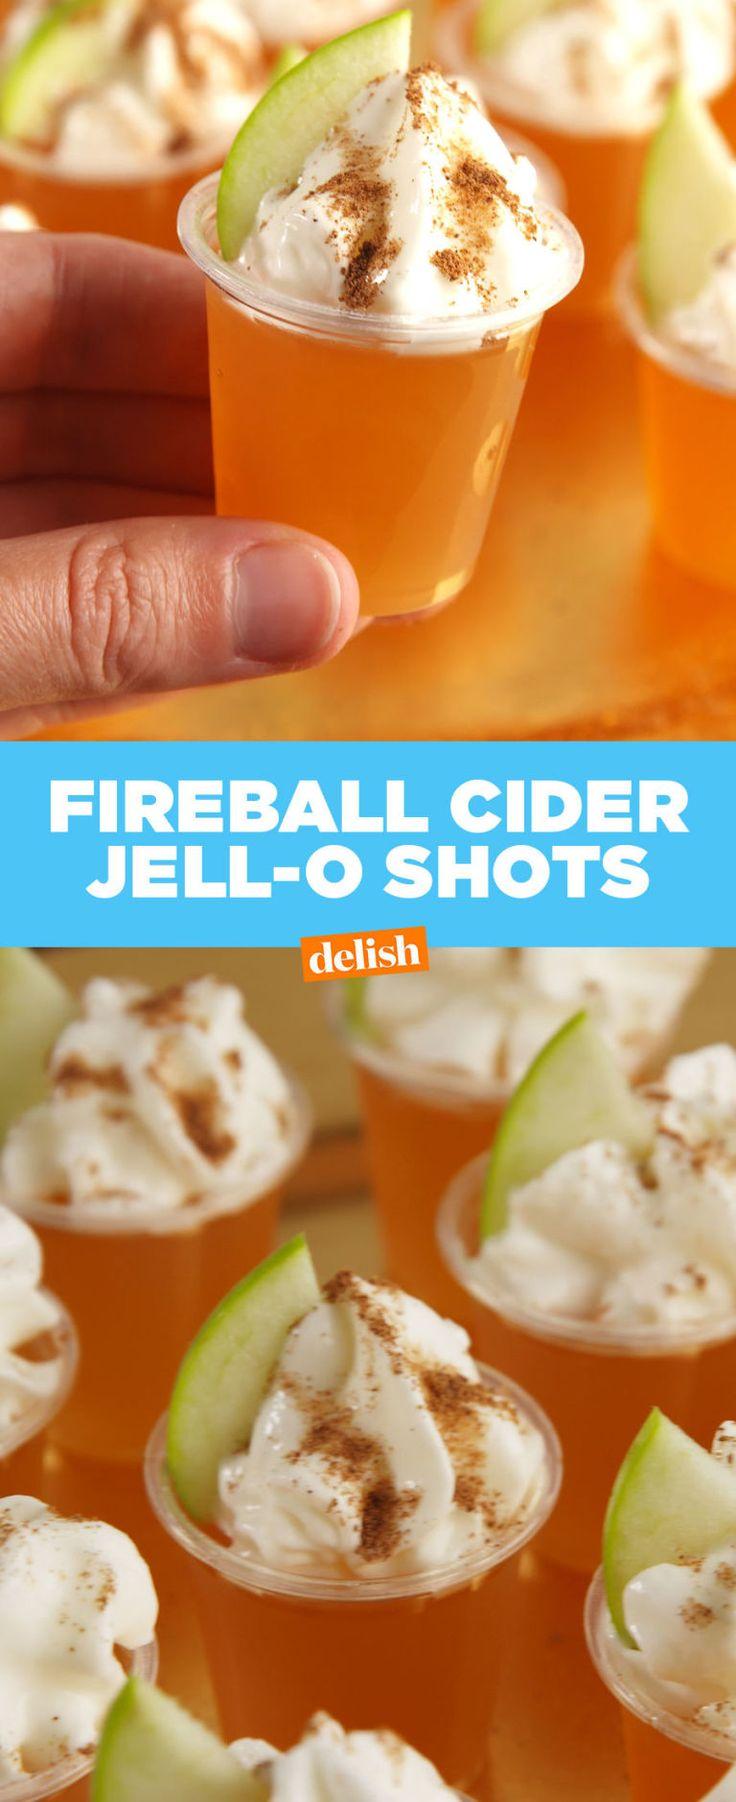 Fireball Cider Jell-O Shots  - Delish.com